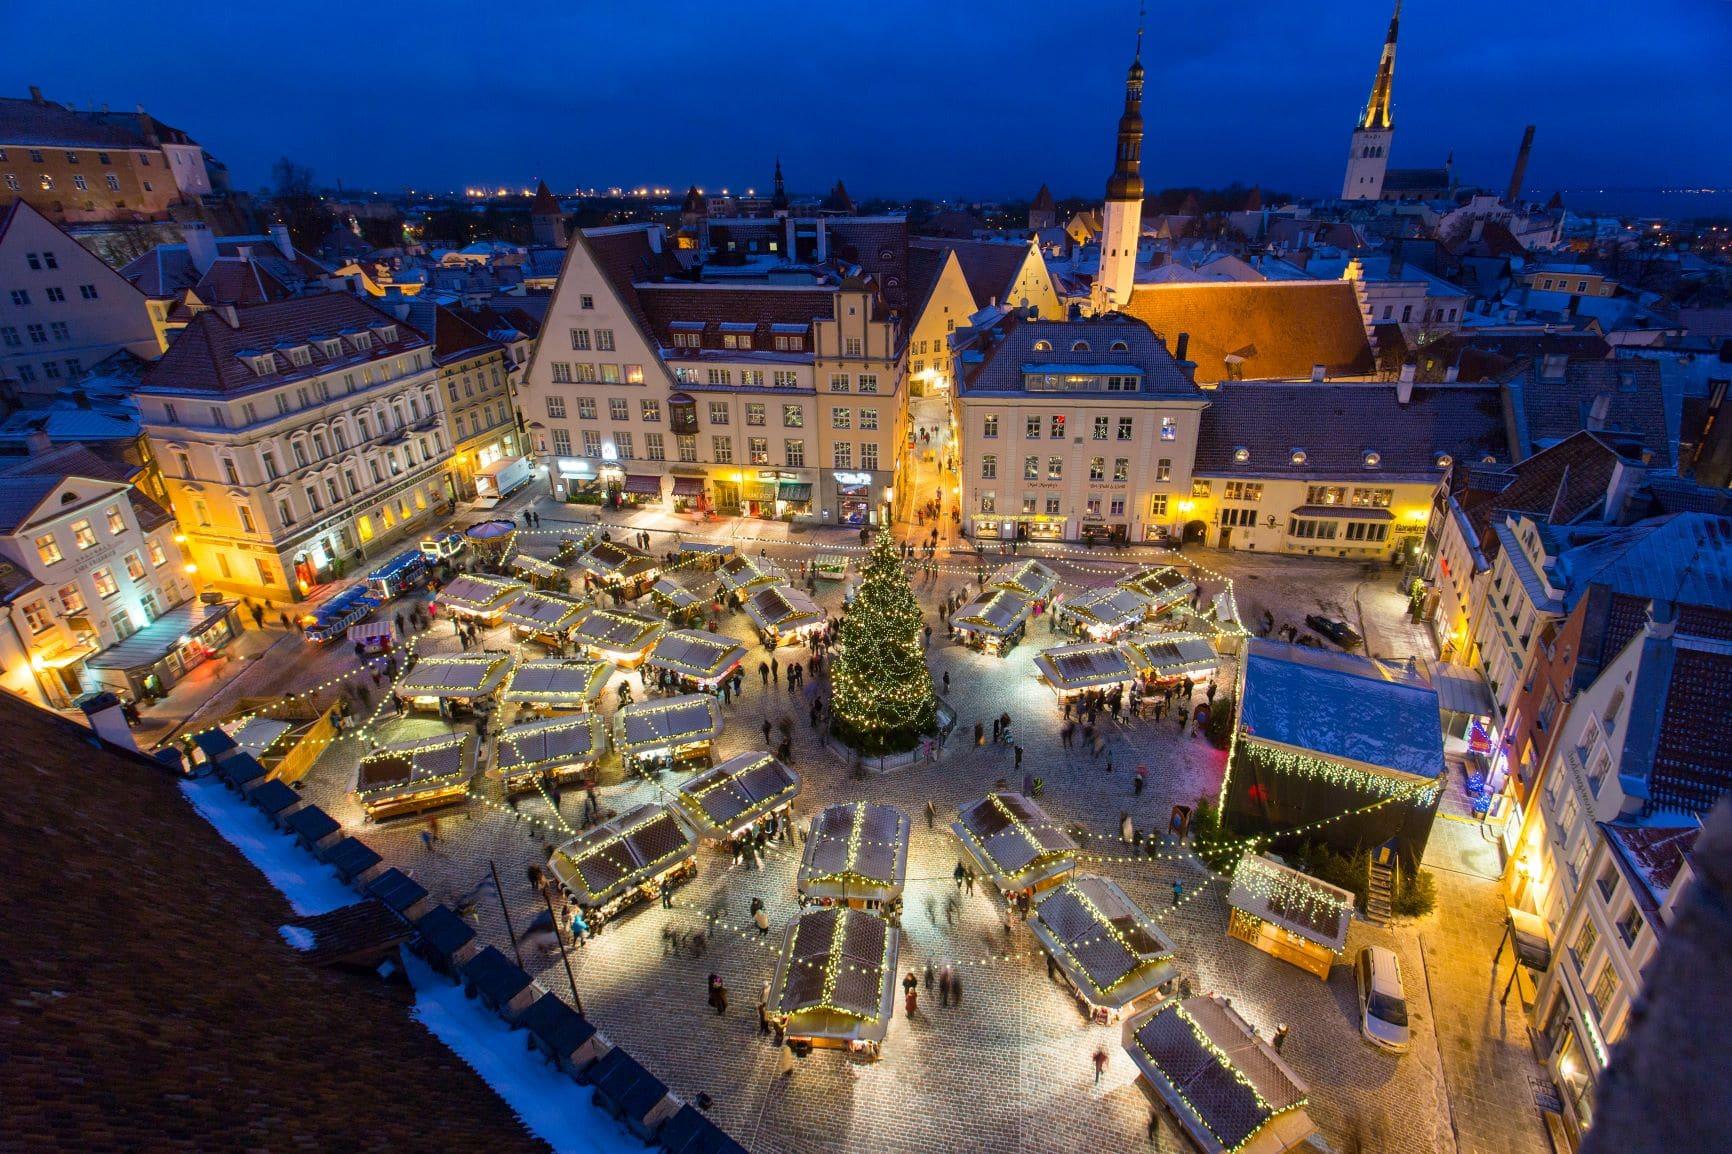 Kerstmarkt Tallinn